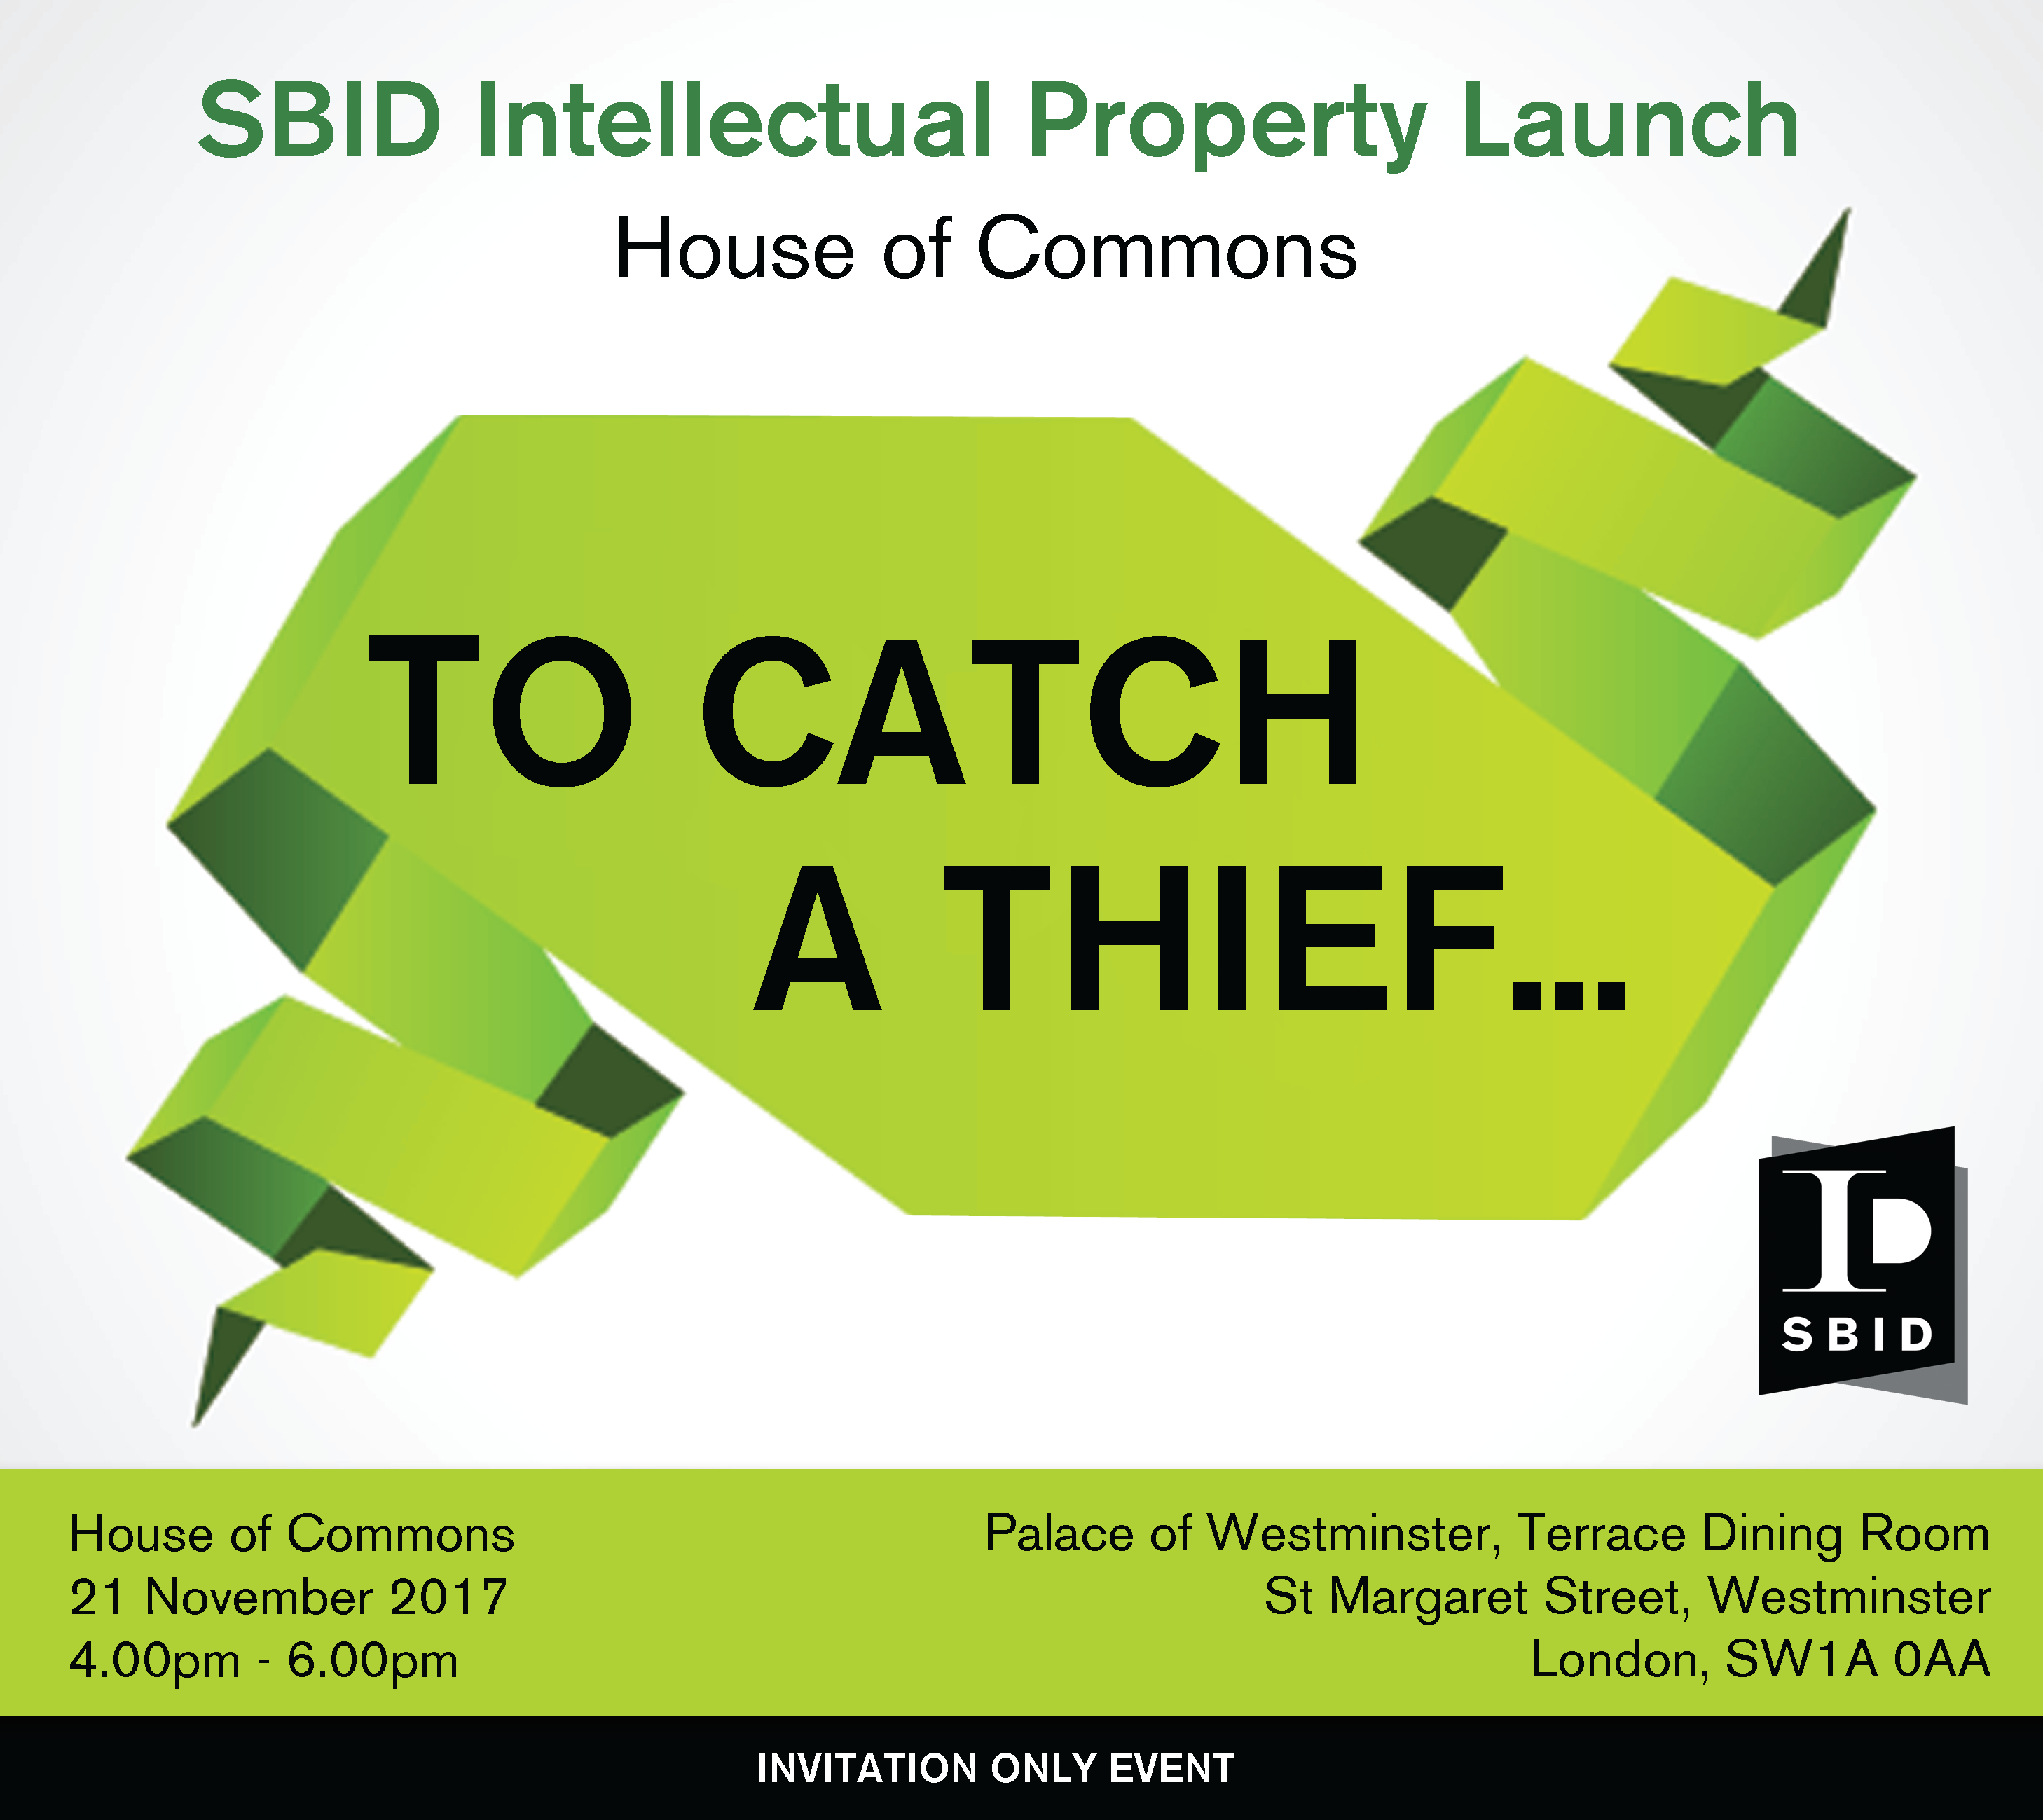 Global Intellectual Property: SBID Intellectual Property Launch